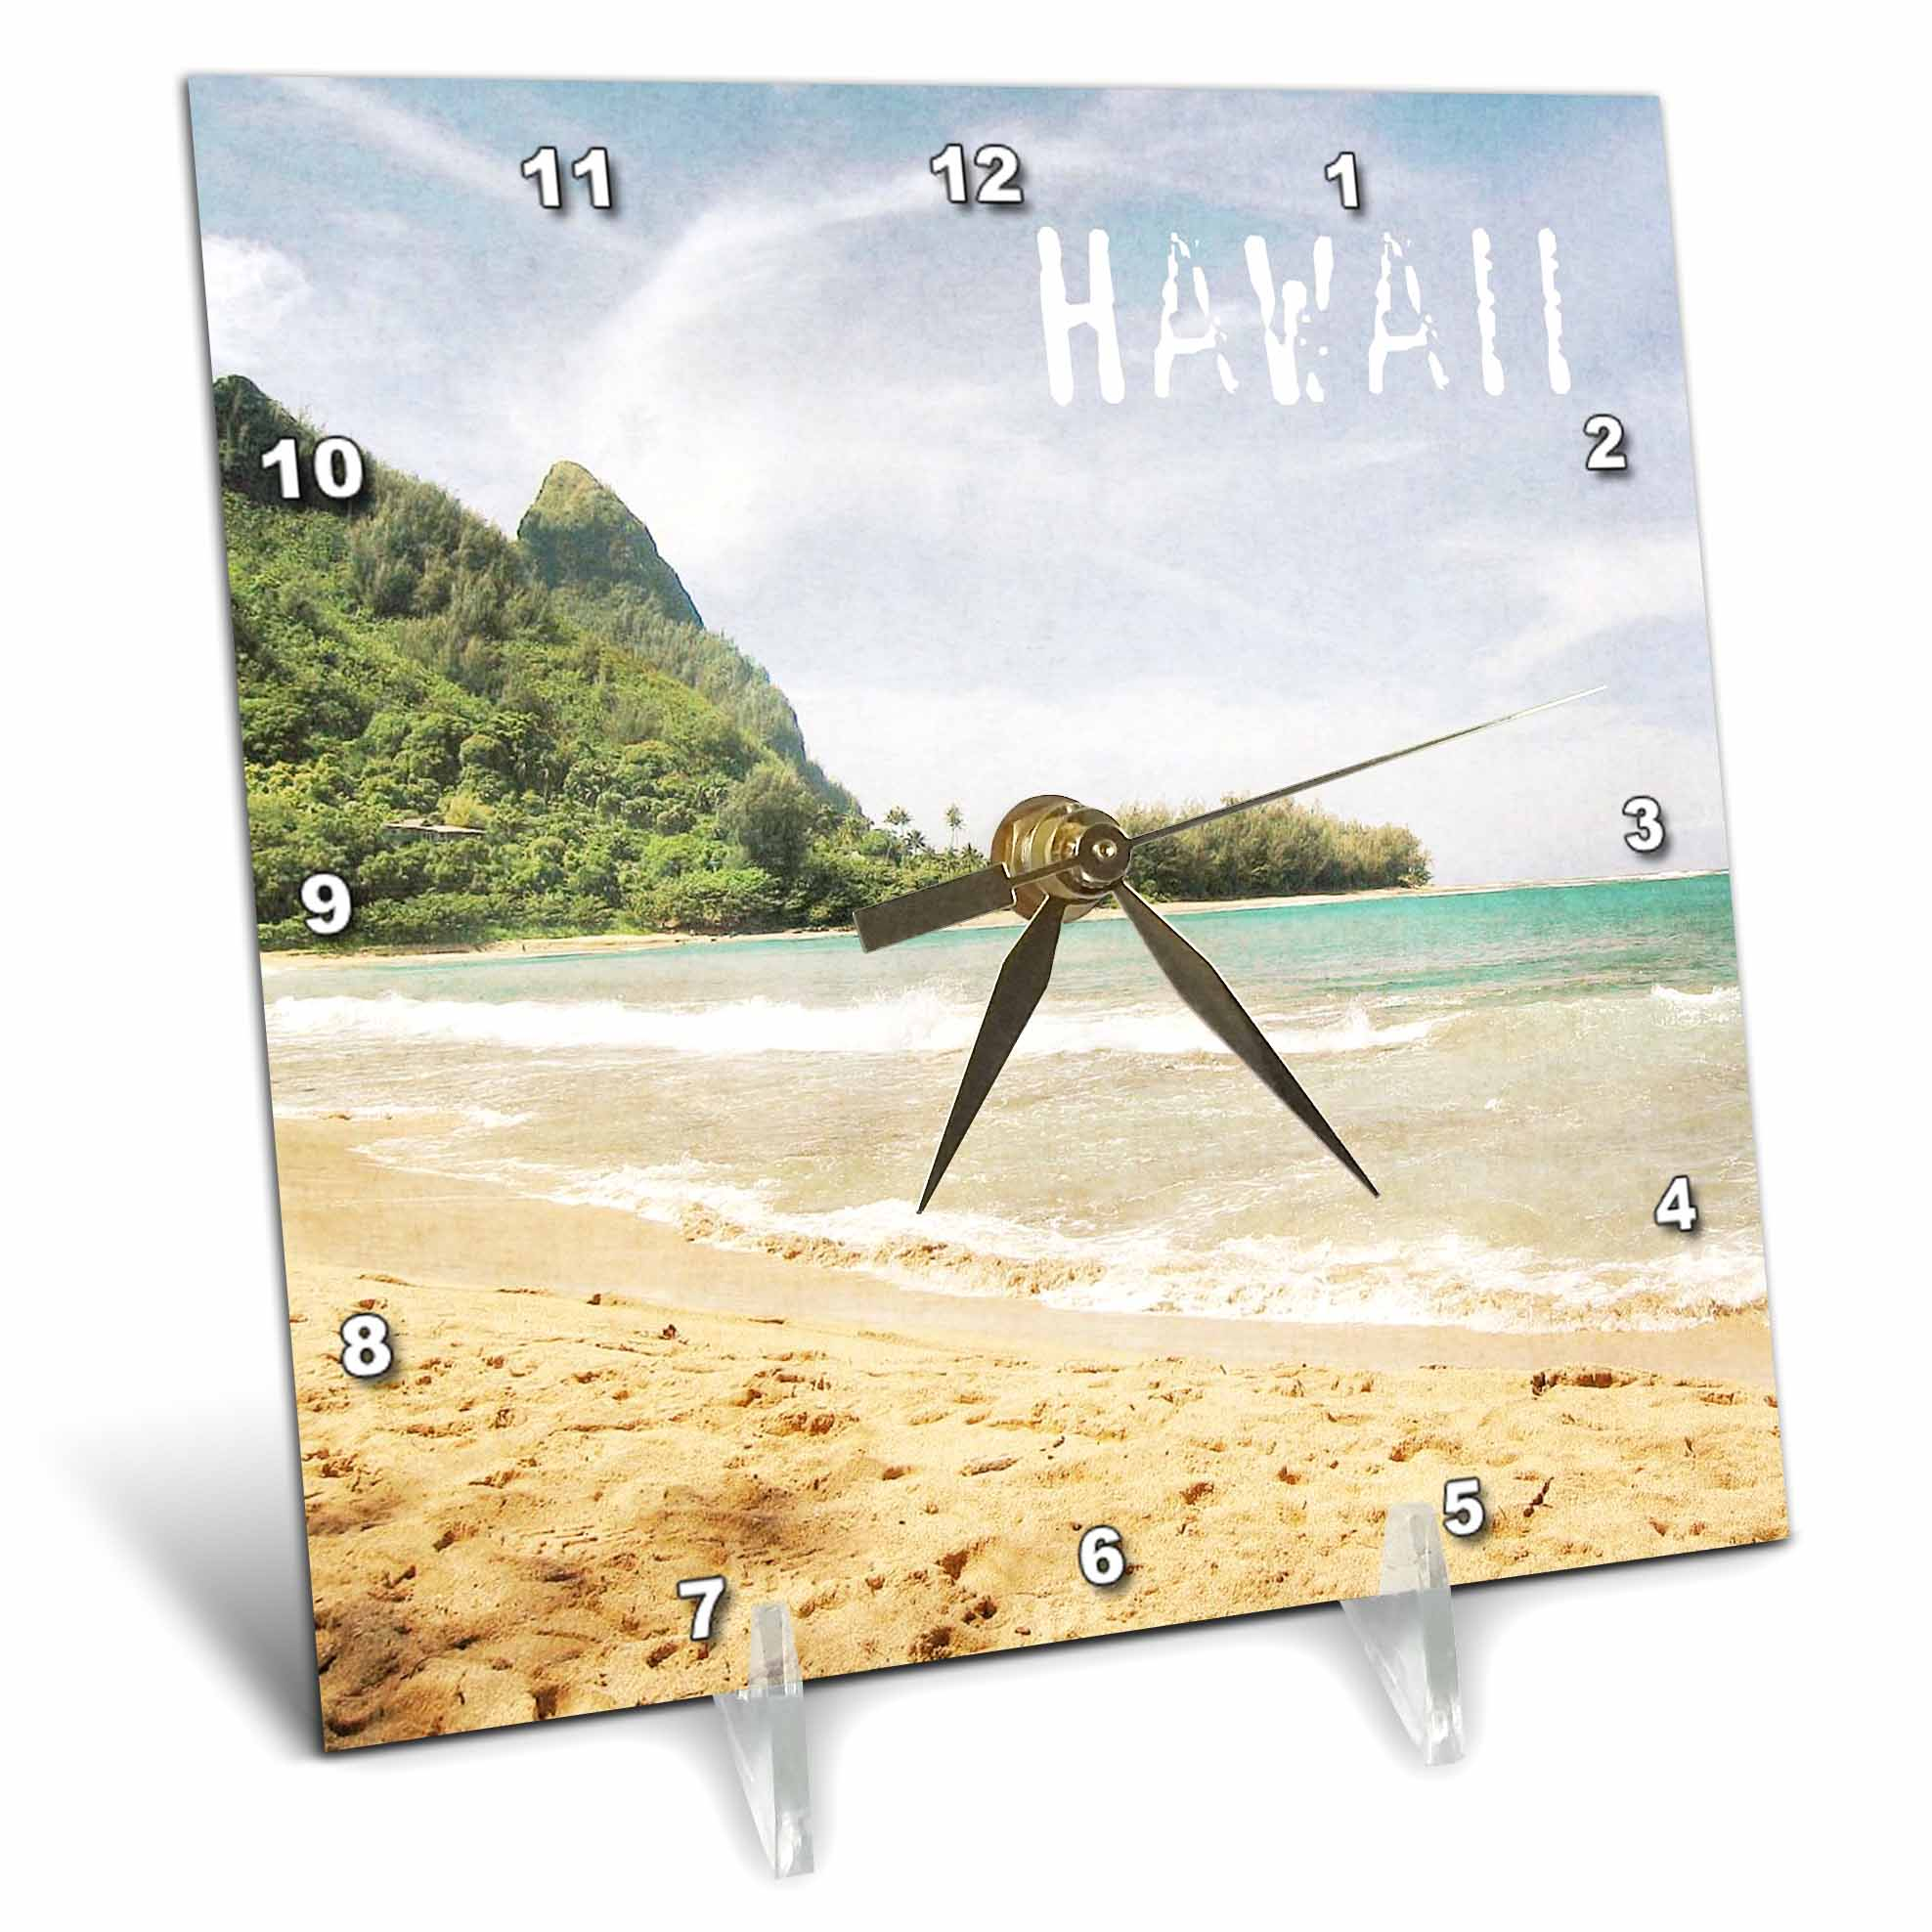 3dRose Kauai Hawaii Tropical Beach, Desk Clock, 6 by 6-inch by 3dRose